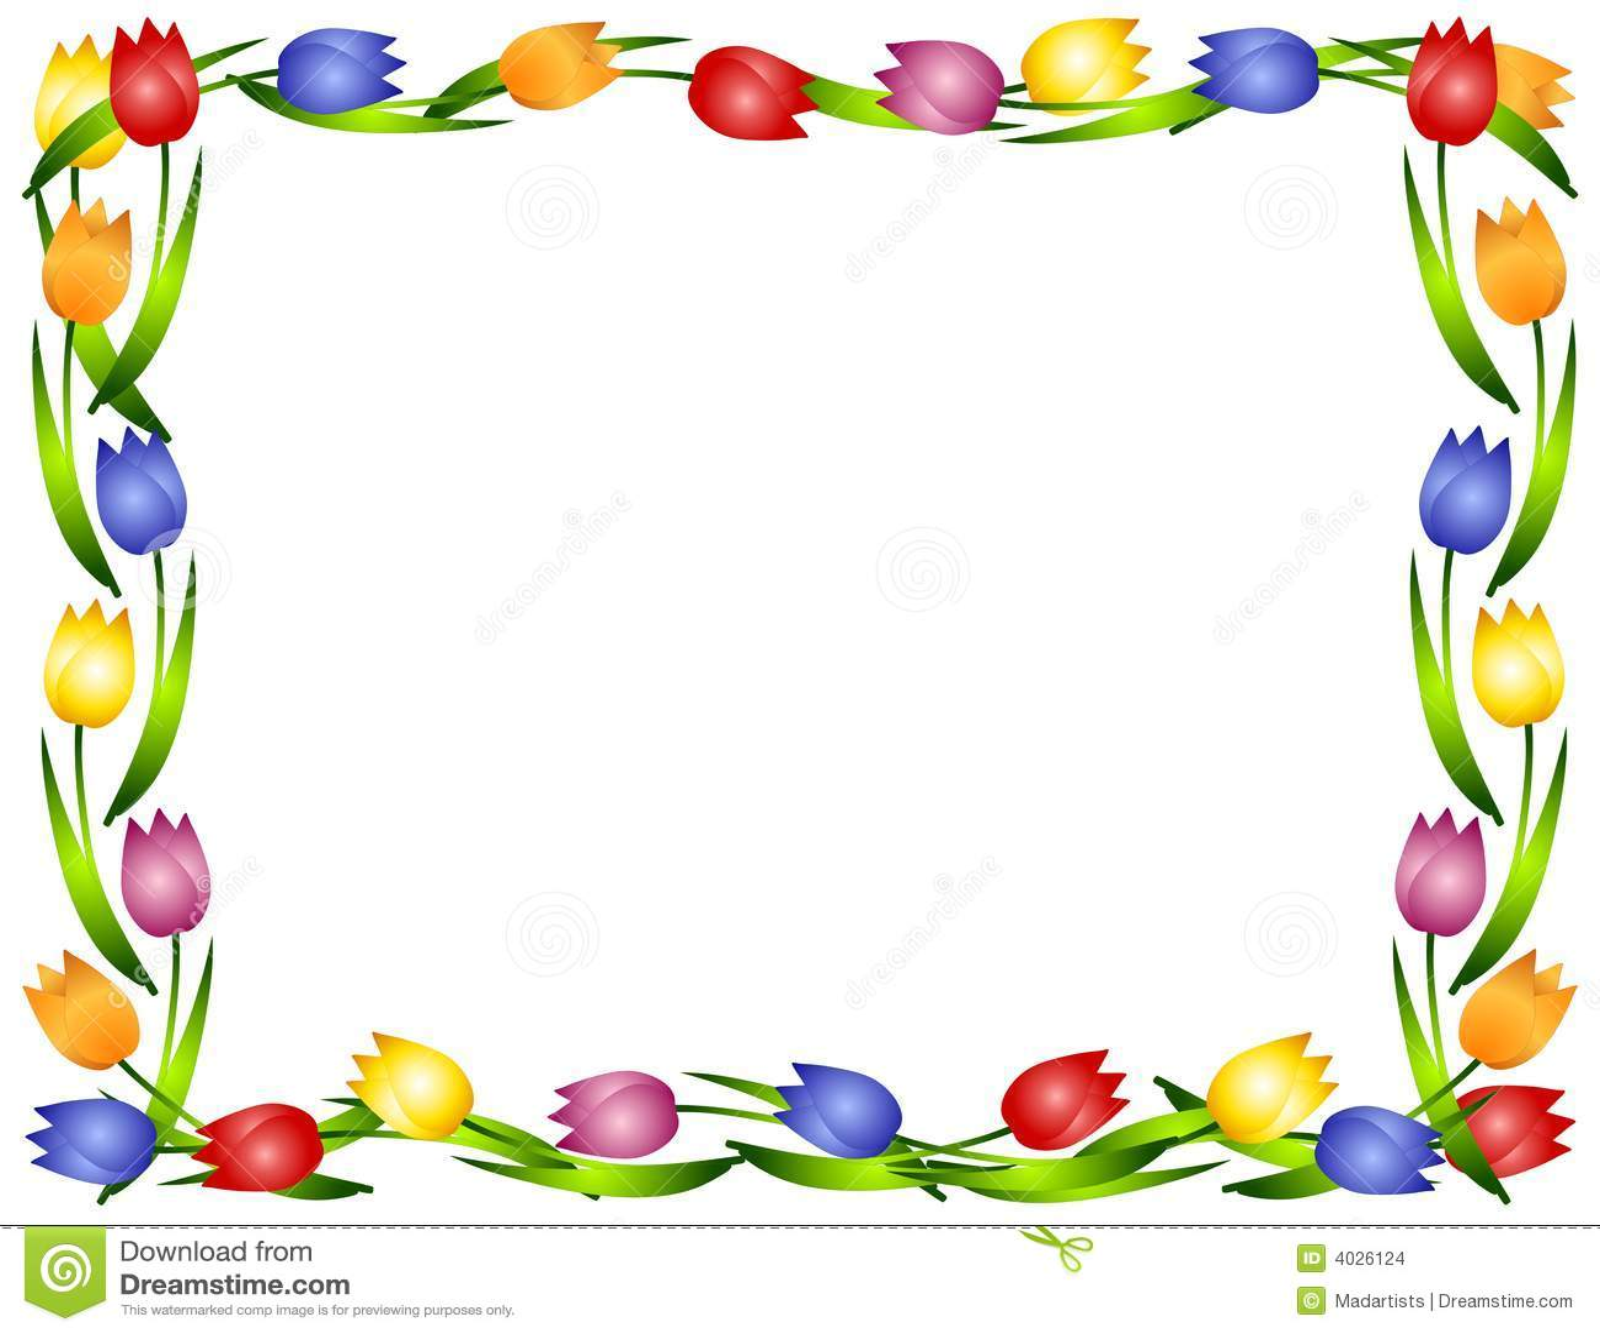 Spring Tulips Flower Frame Or Border Stock Images - Image ... Tulips Border Clipart